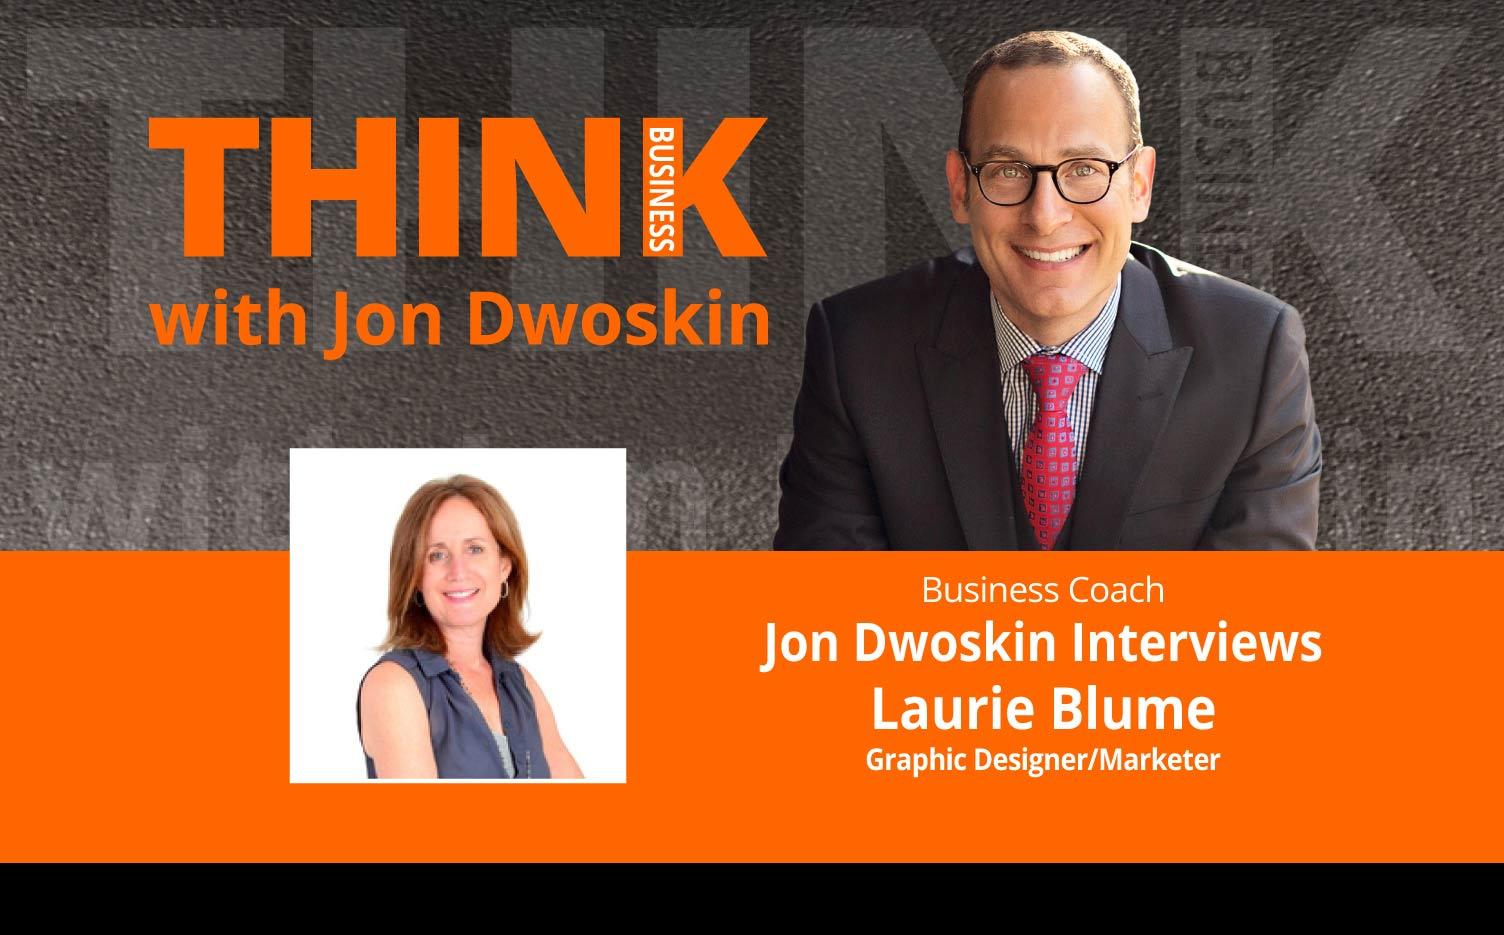 THINK Business Podcast: Jon Dwoskin Interviews Laurie Blume, Graphic Designer/Marketer